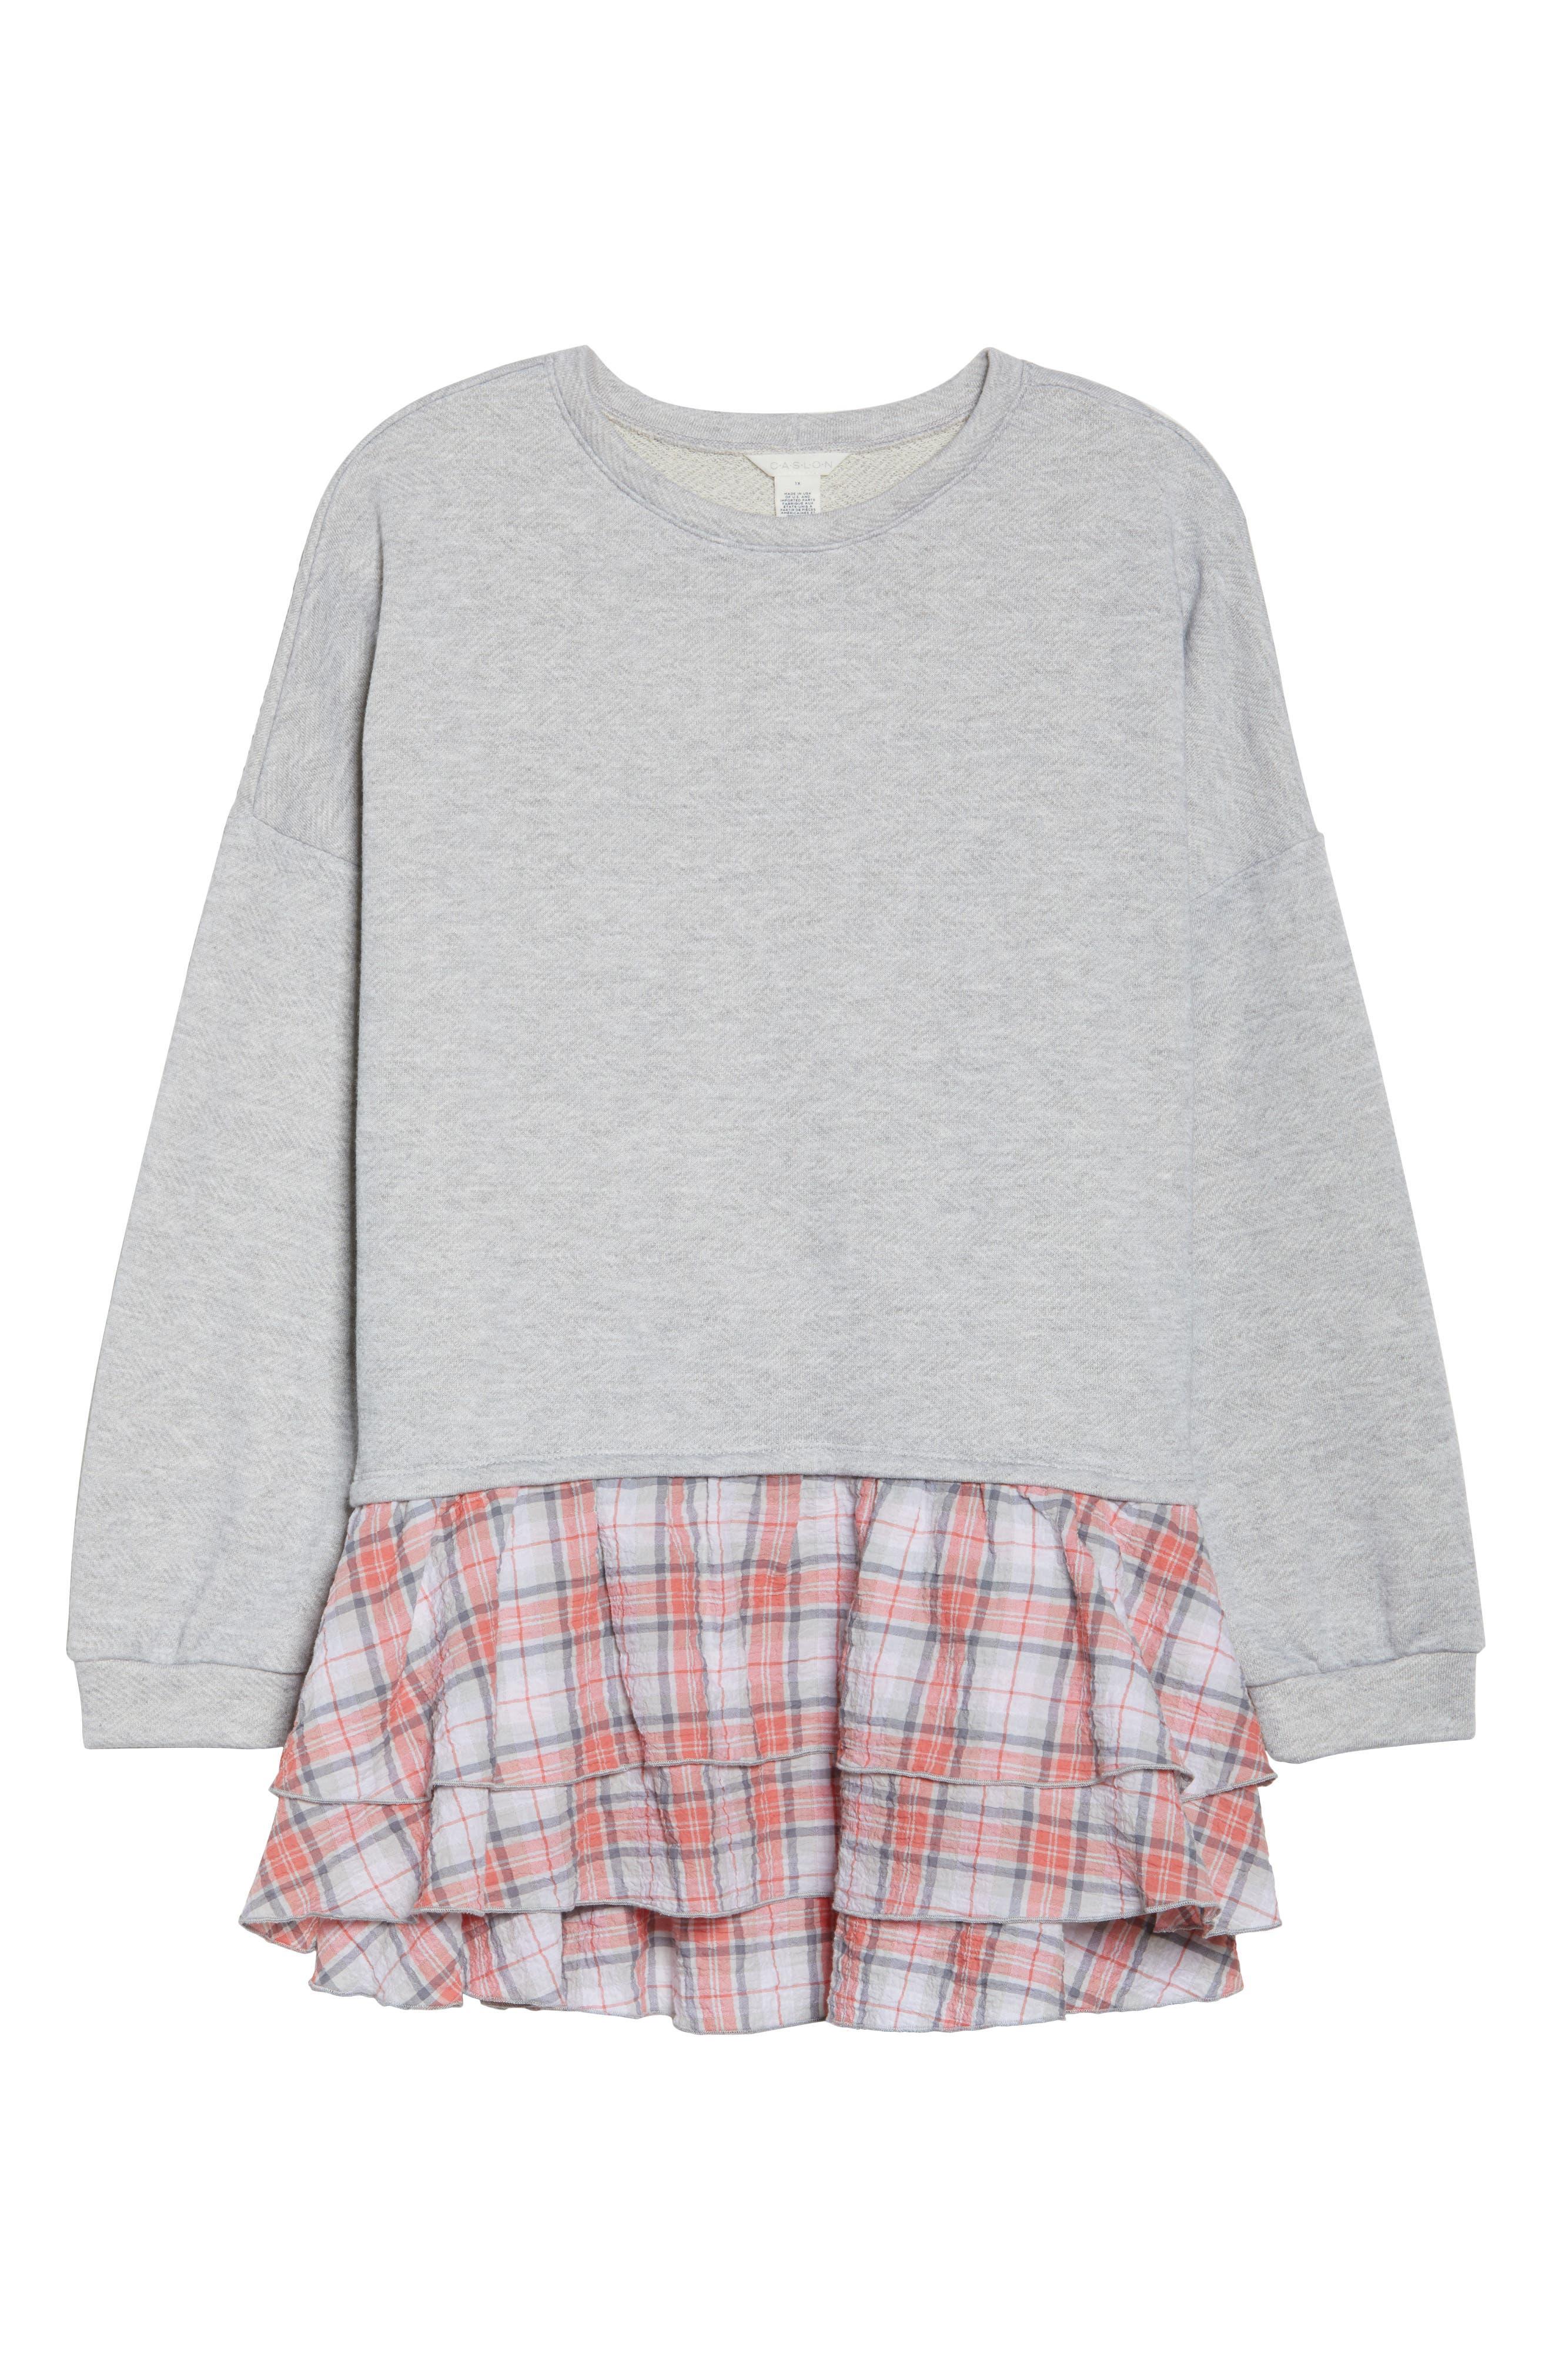 Layered Look Sweatshirt,                             Alternate thumbnail 6, color,                             030